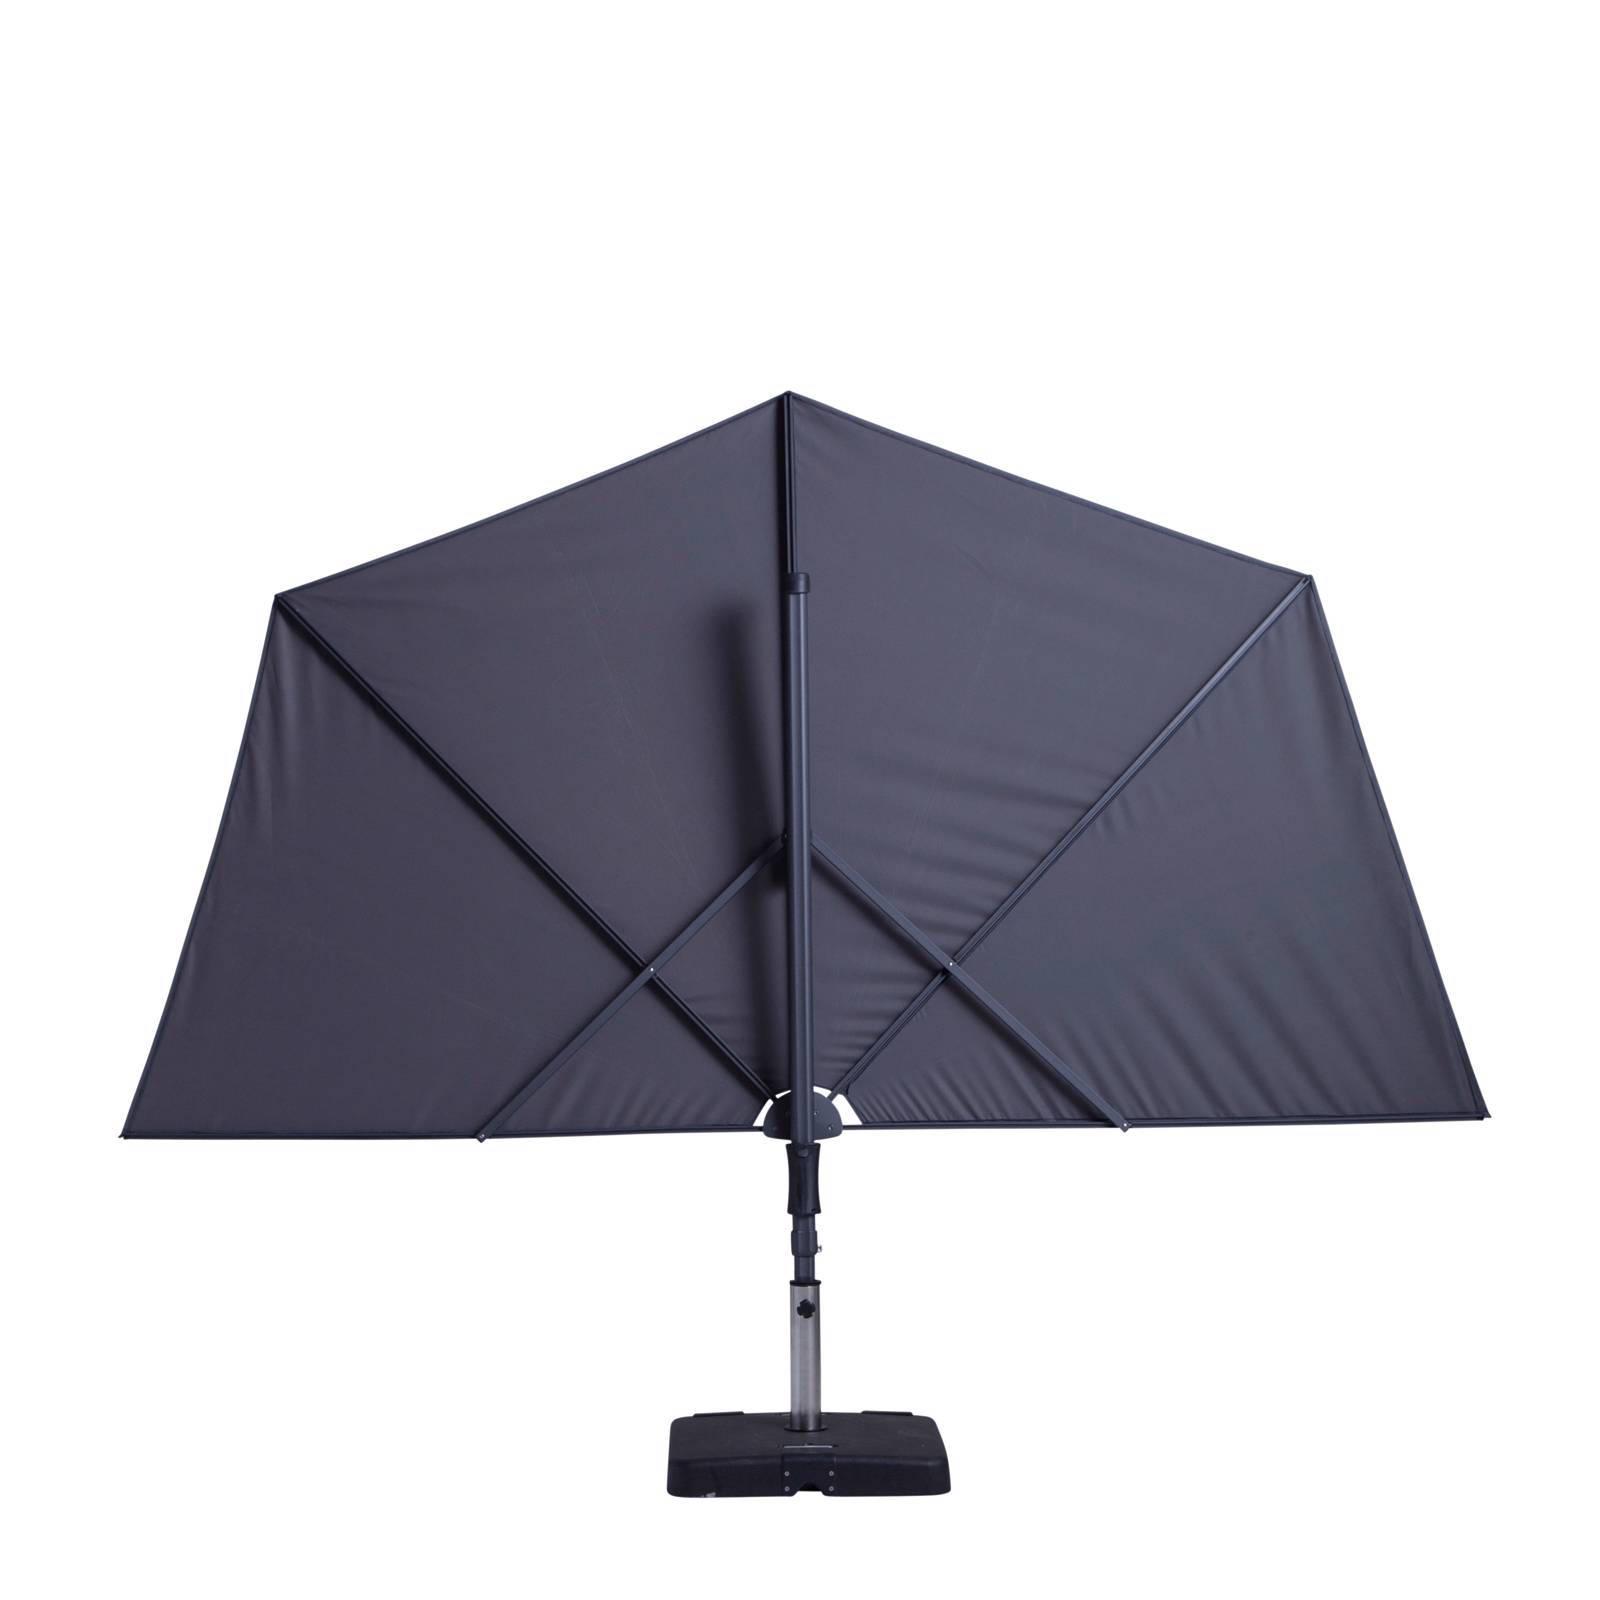 Parasol Voor Balkon.Madison Balkonparasol Sun Wave 270x150 Cm Wehkamp